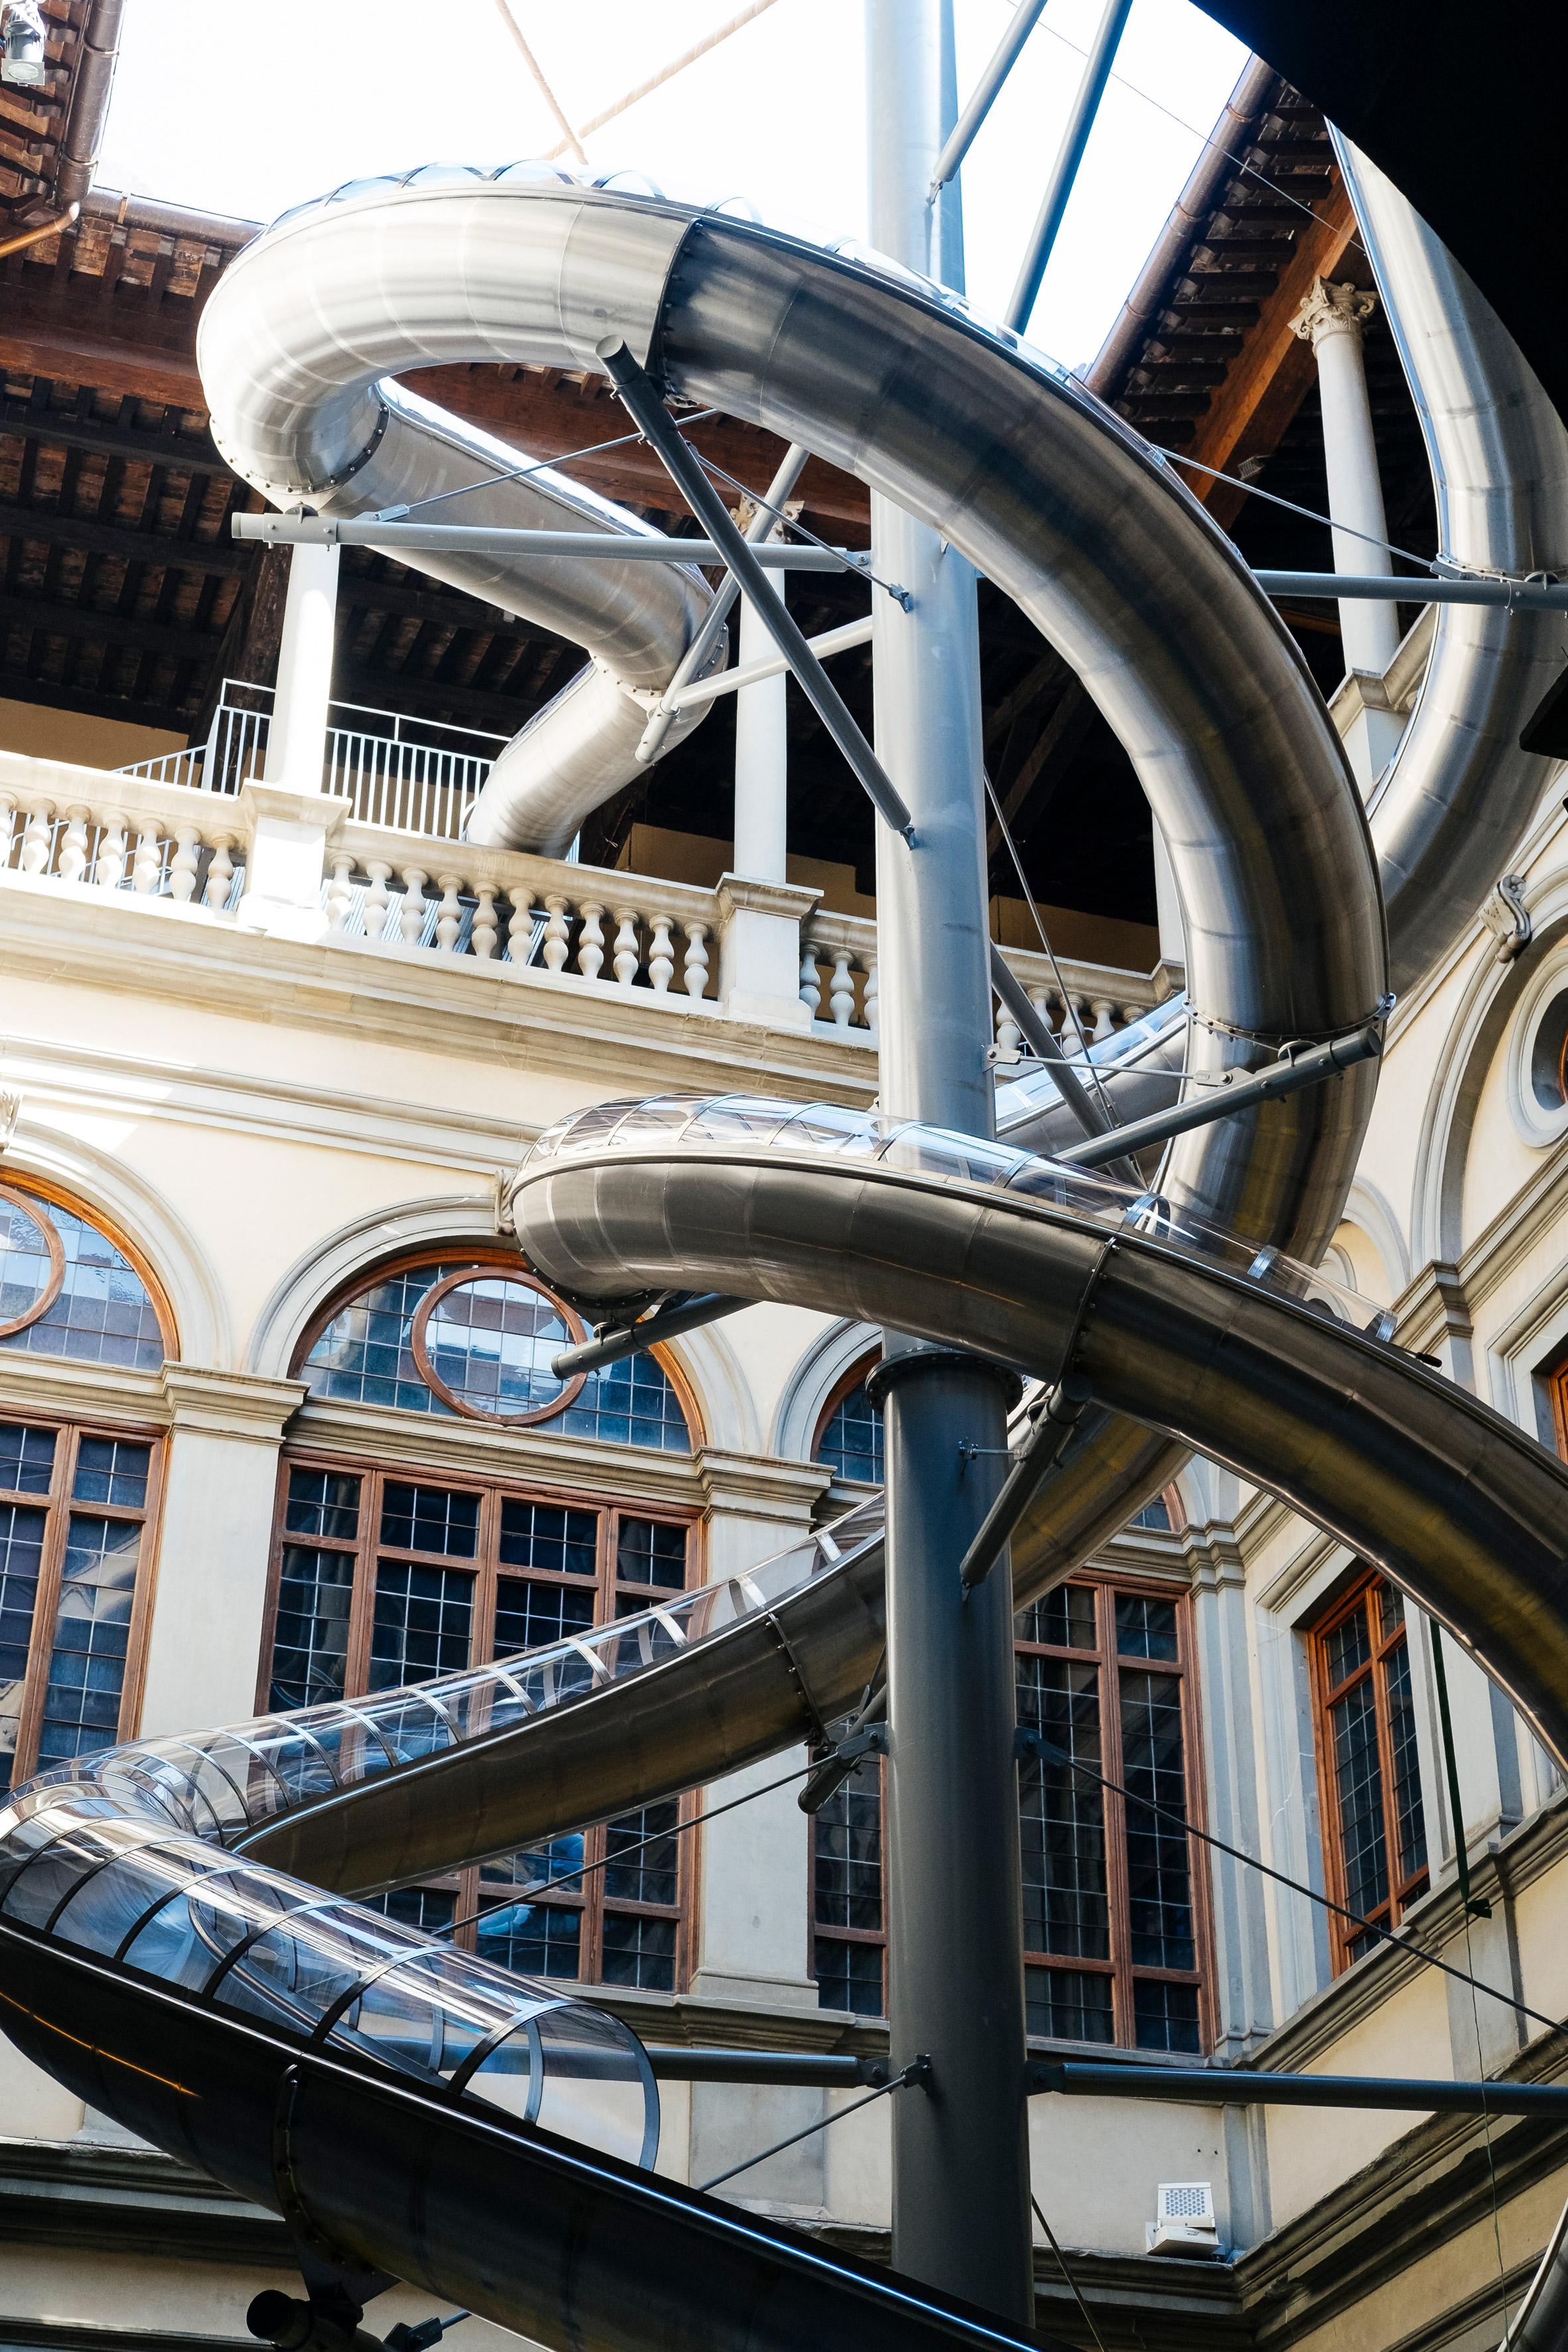 Carsten Holler Slide, photograph by Martino Margheri